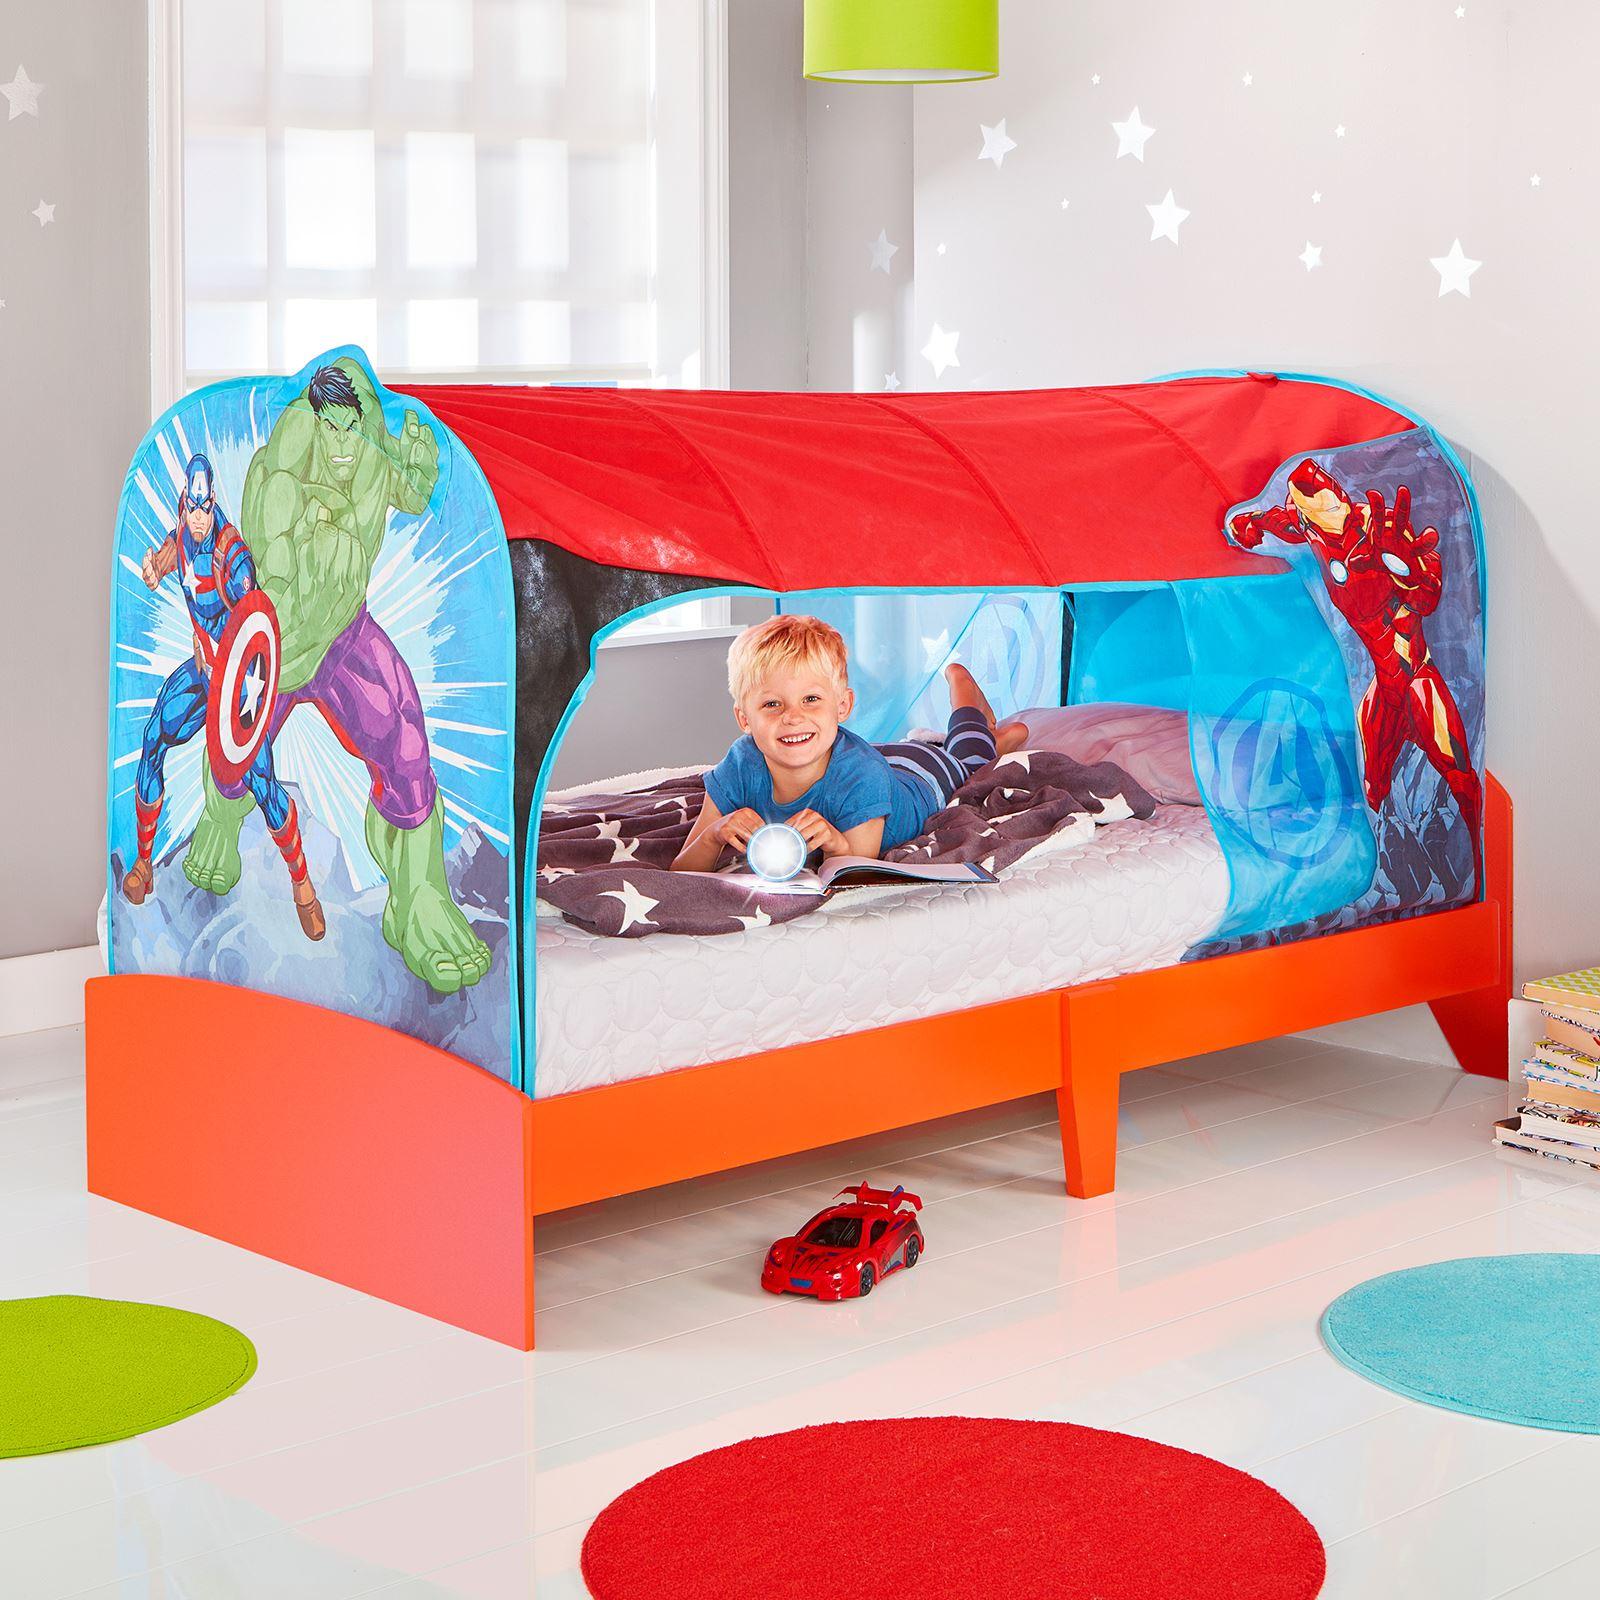 MID-SLEEPER OVER BED & BED TENT KIDS BOYS BEDROOM - MARVEL ...